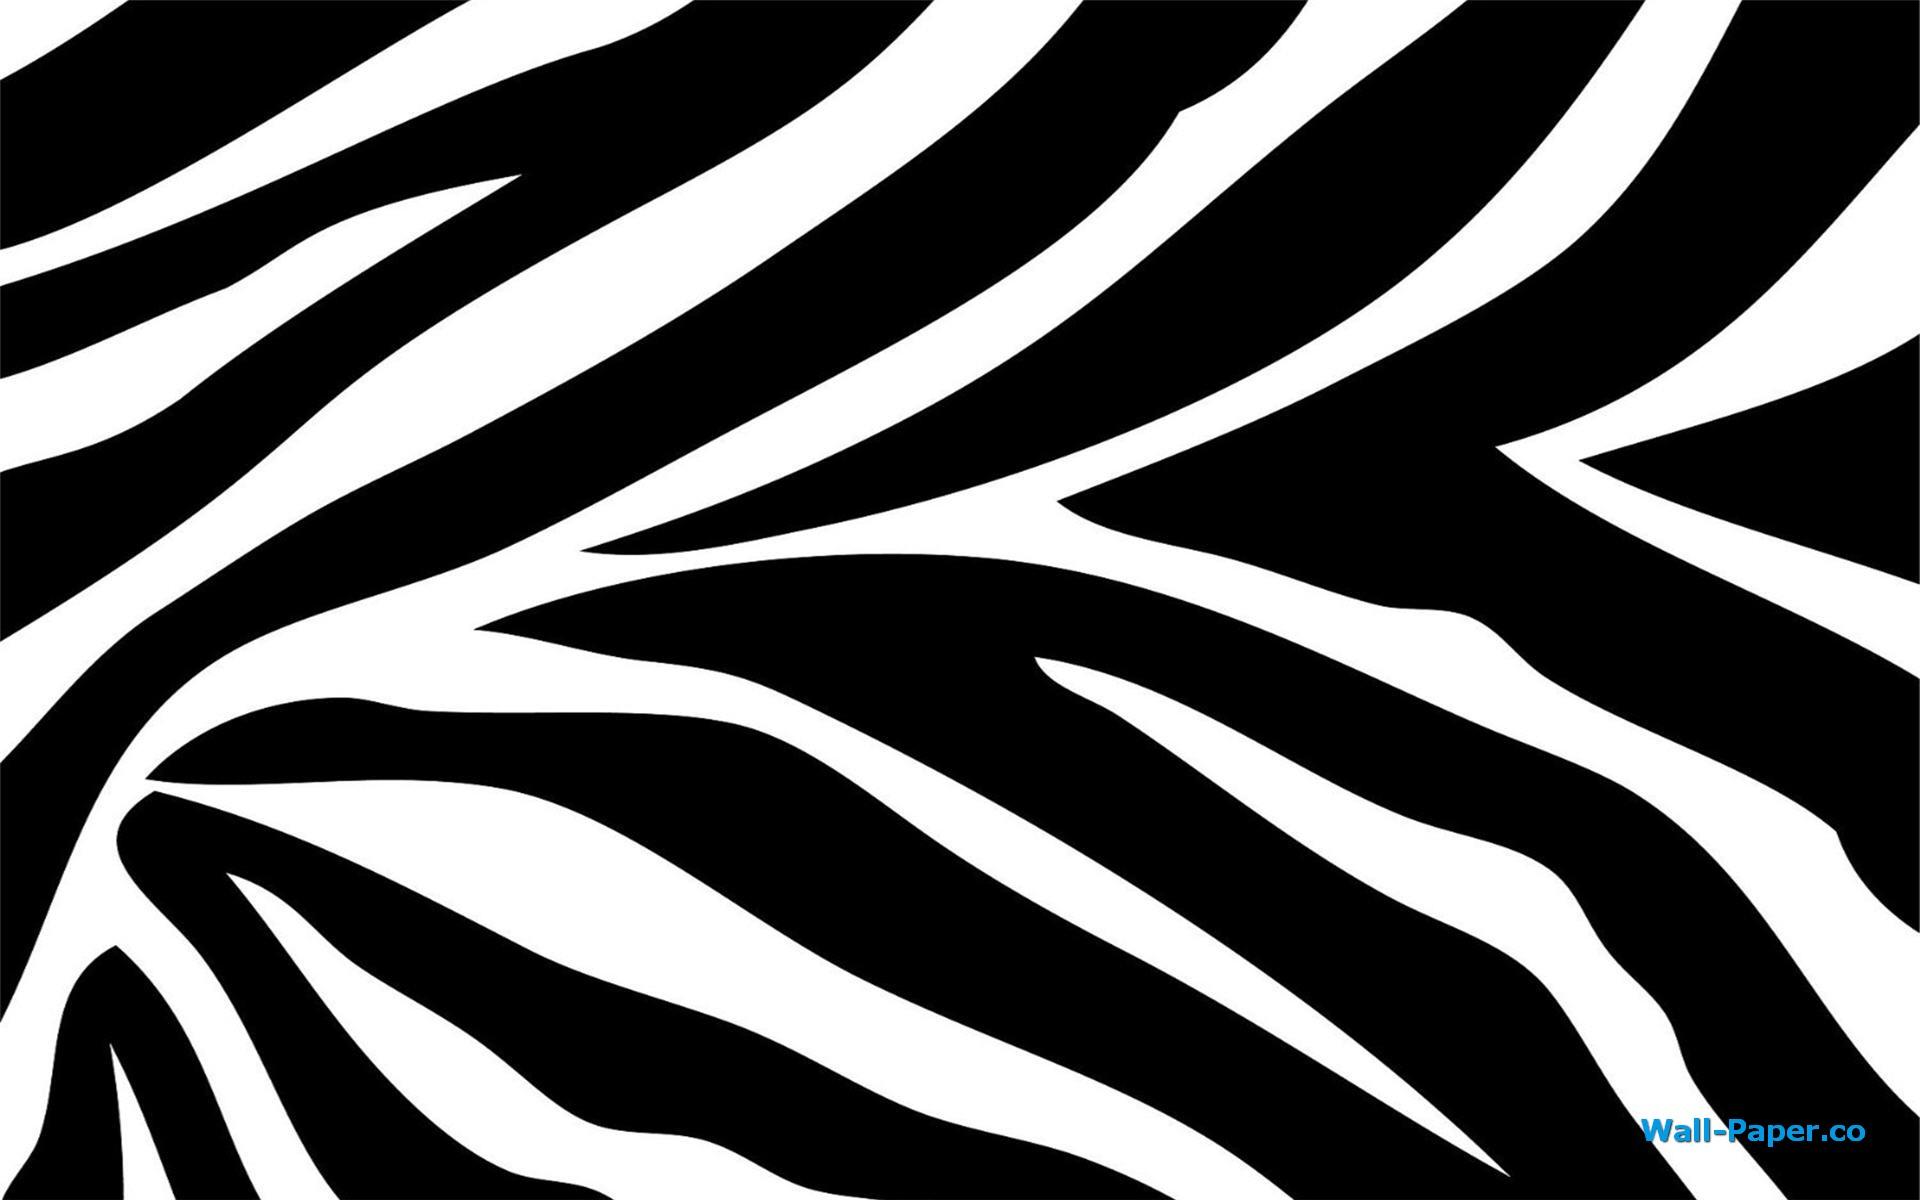 Zebra patterned wallpaper - Hd Creative Zebra Print Pictures Full Hd Wallpapers 1920 1200